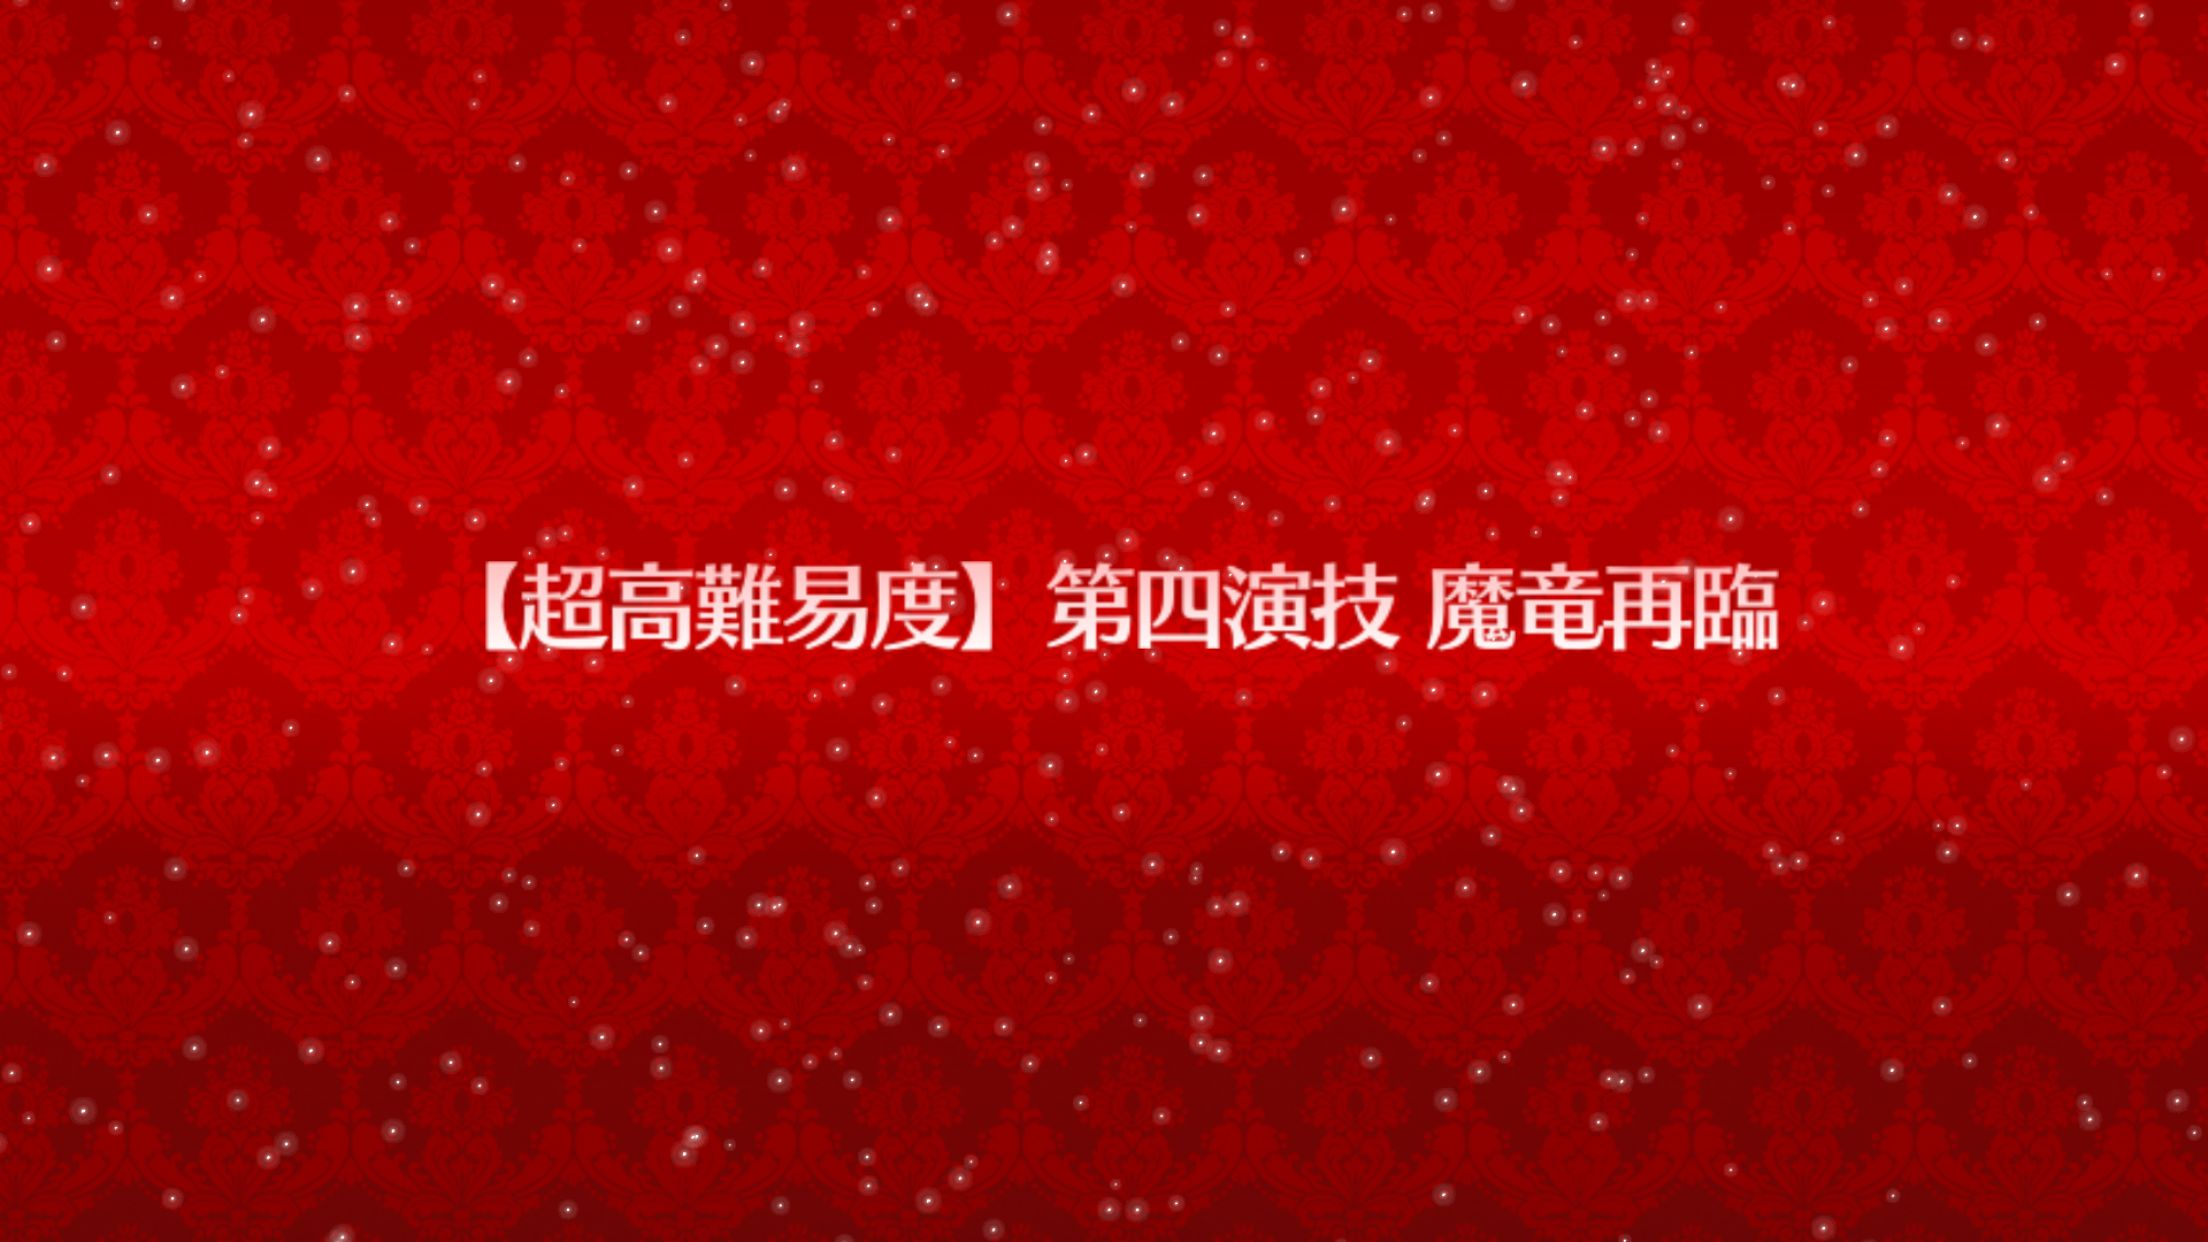 【FGO】ネロ祭り エキシビションクエスト 第四演技 魔竜再臨 攻略